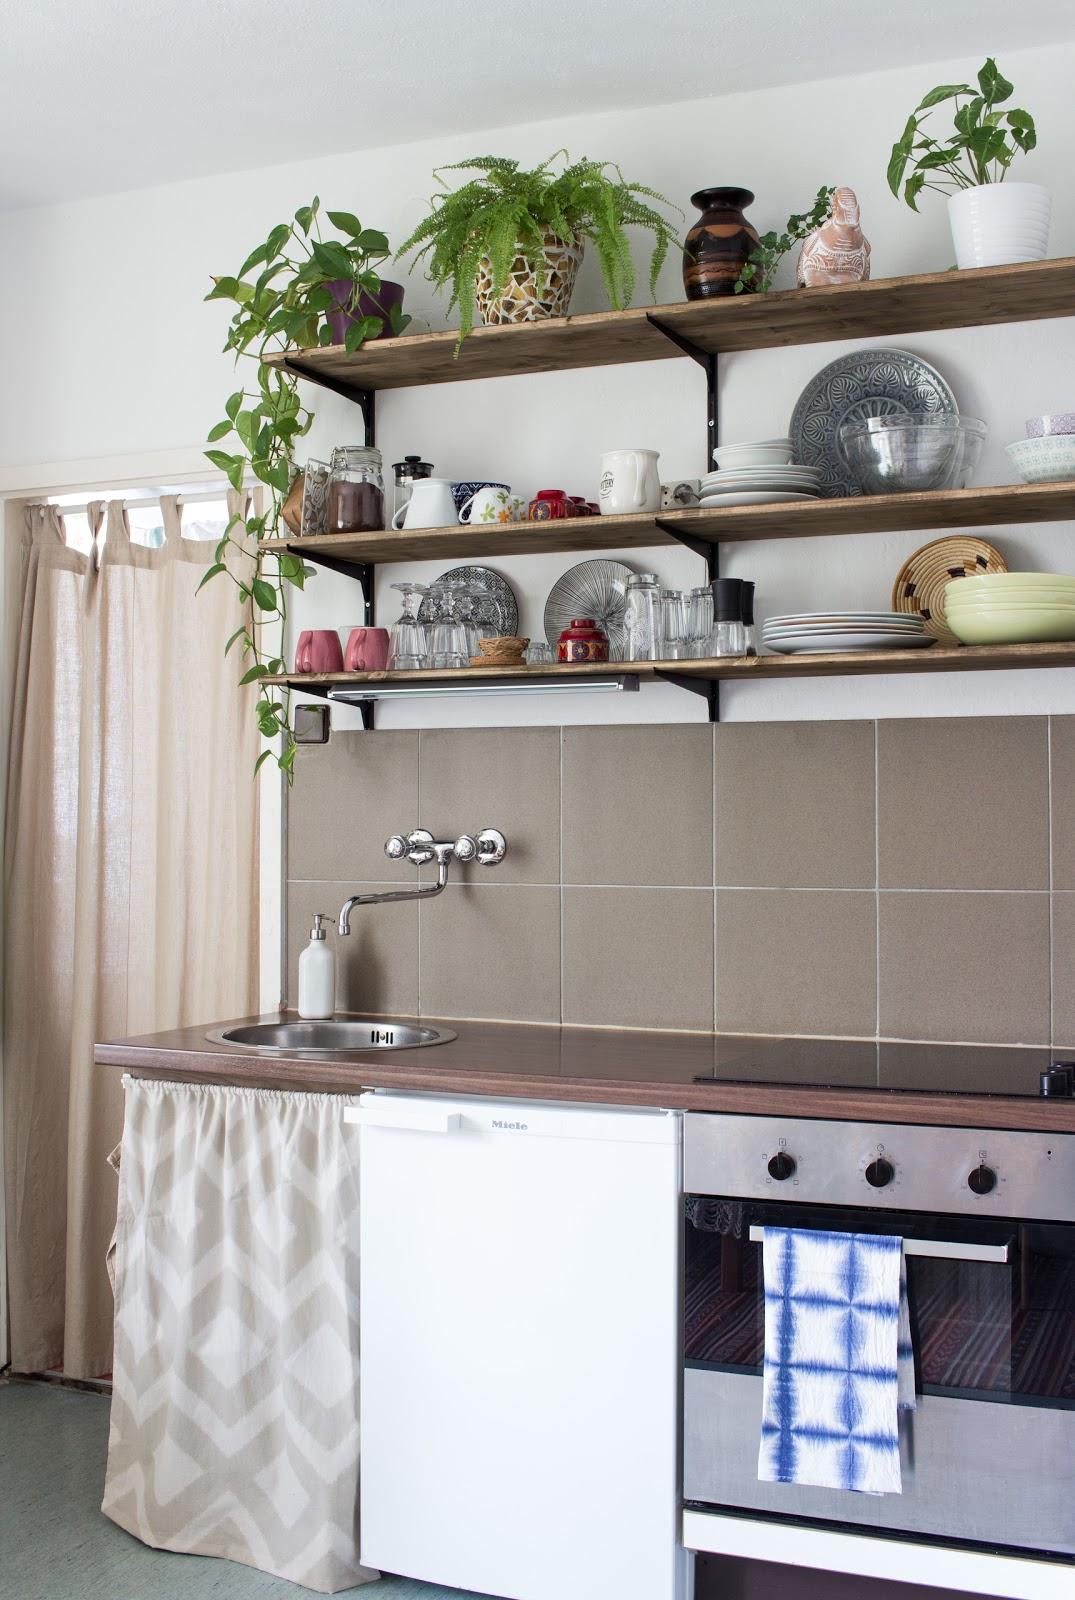 Full Size of Vorhänge Küche Modern Vintage Vorhänge Küche Vorhänge Küche Landhausstil Vorhänge Küche Ideen Modern Küche Vorhänge Küche